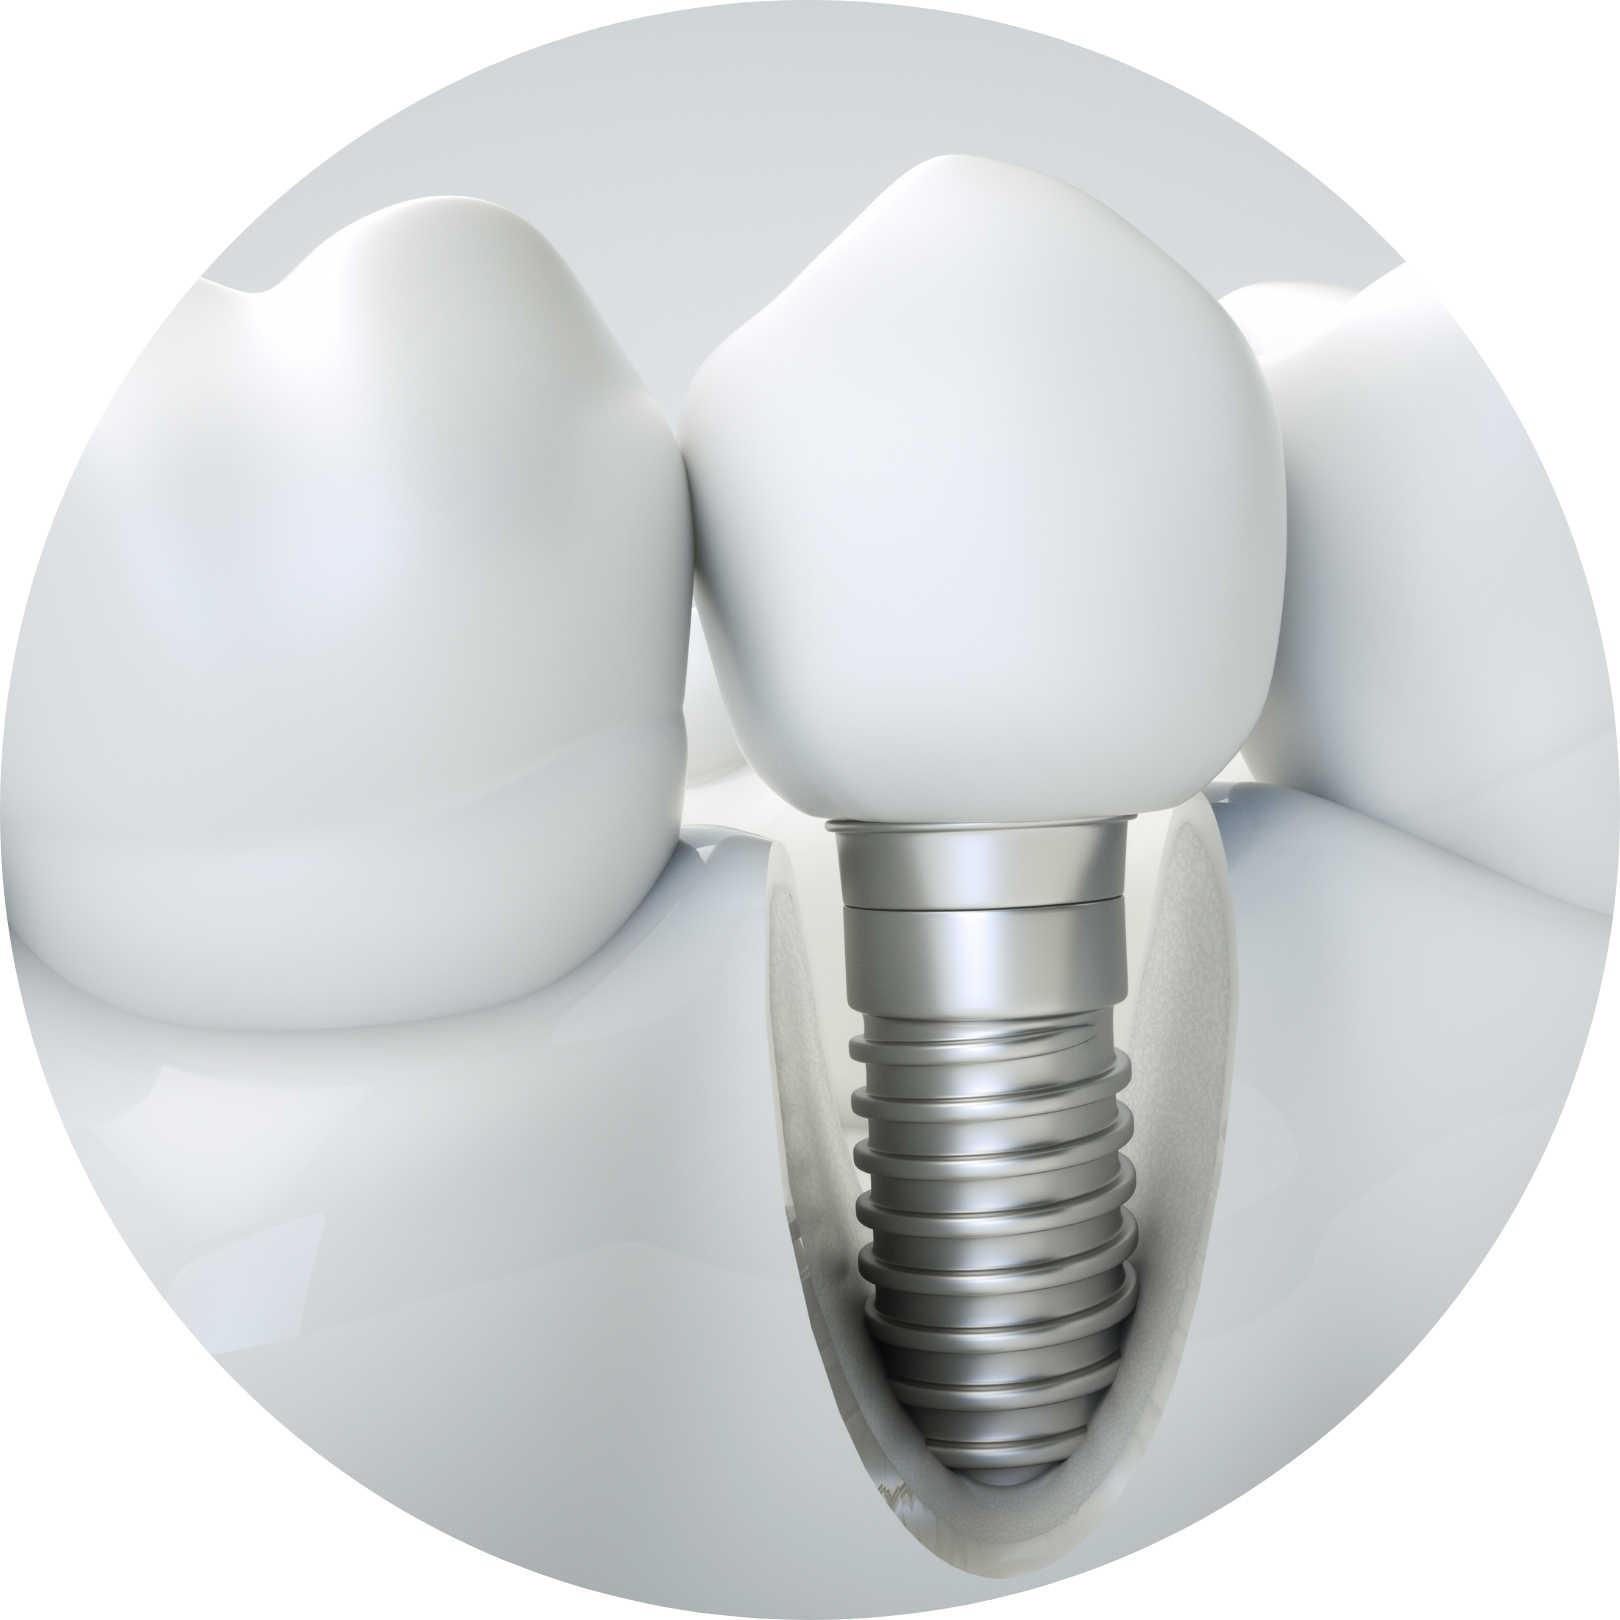 dental-implants-st-clair-dentist